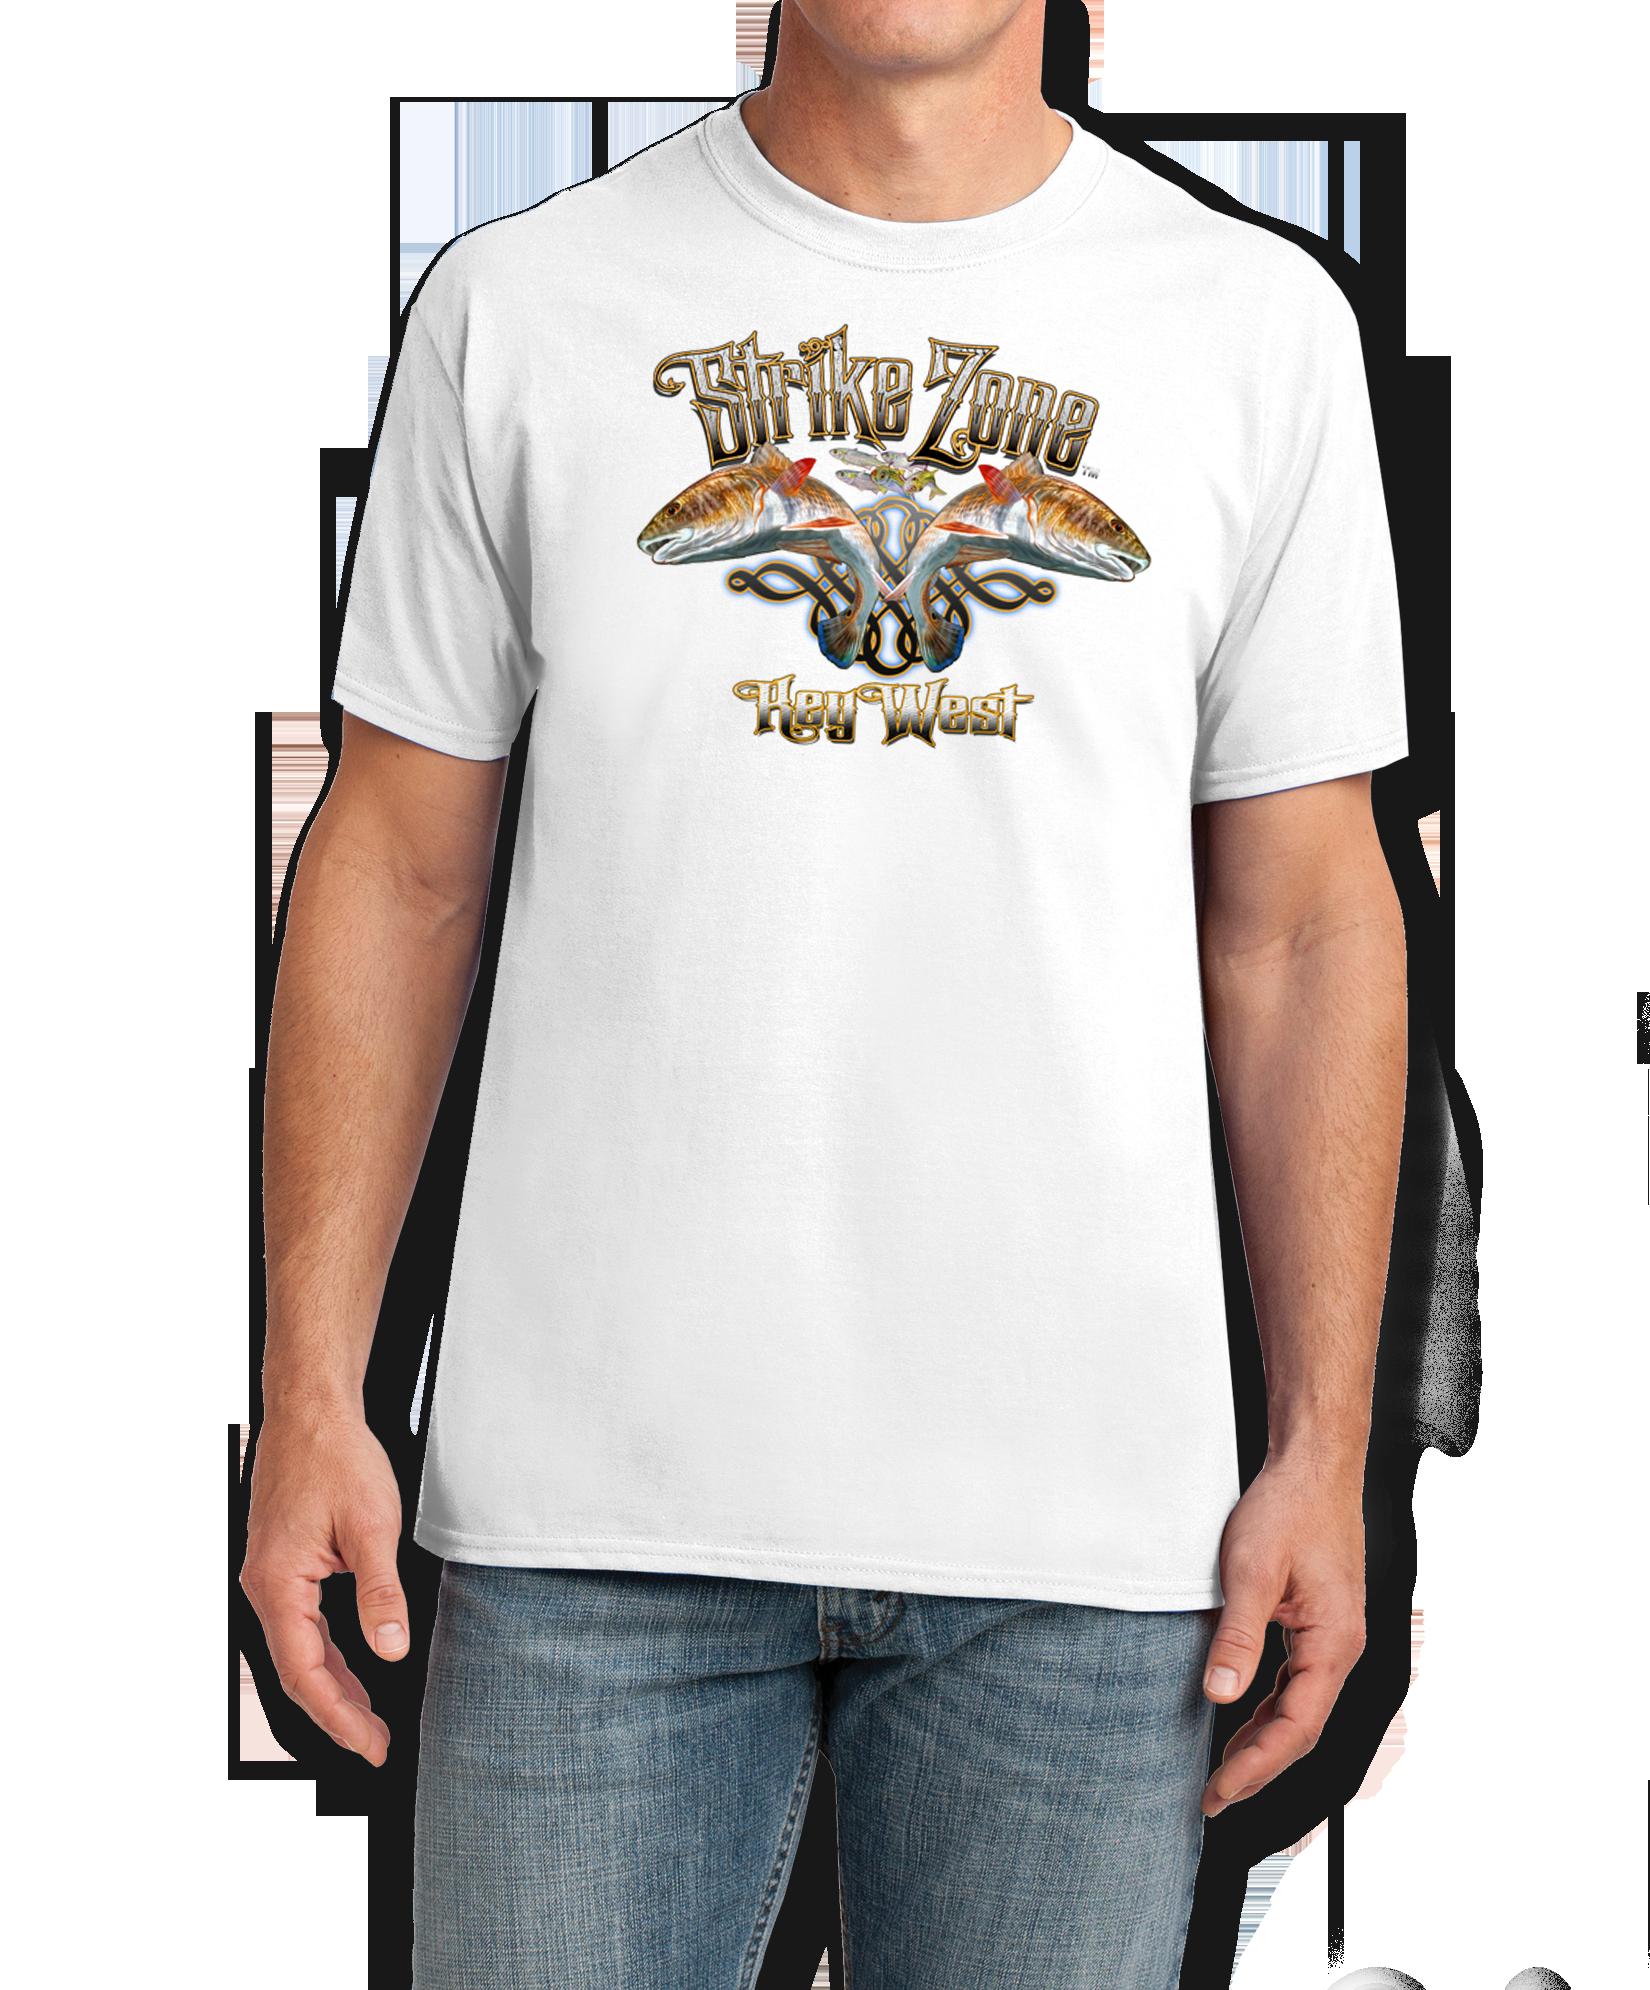 t-shirt-jason-mathias-cotton-white-redfish-front-chest.png